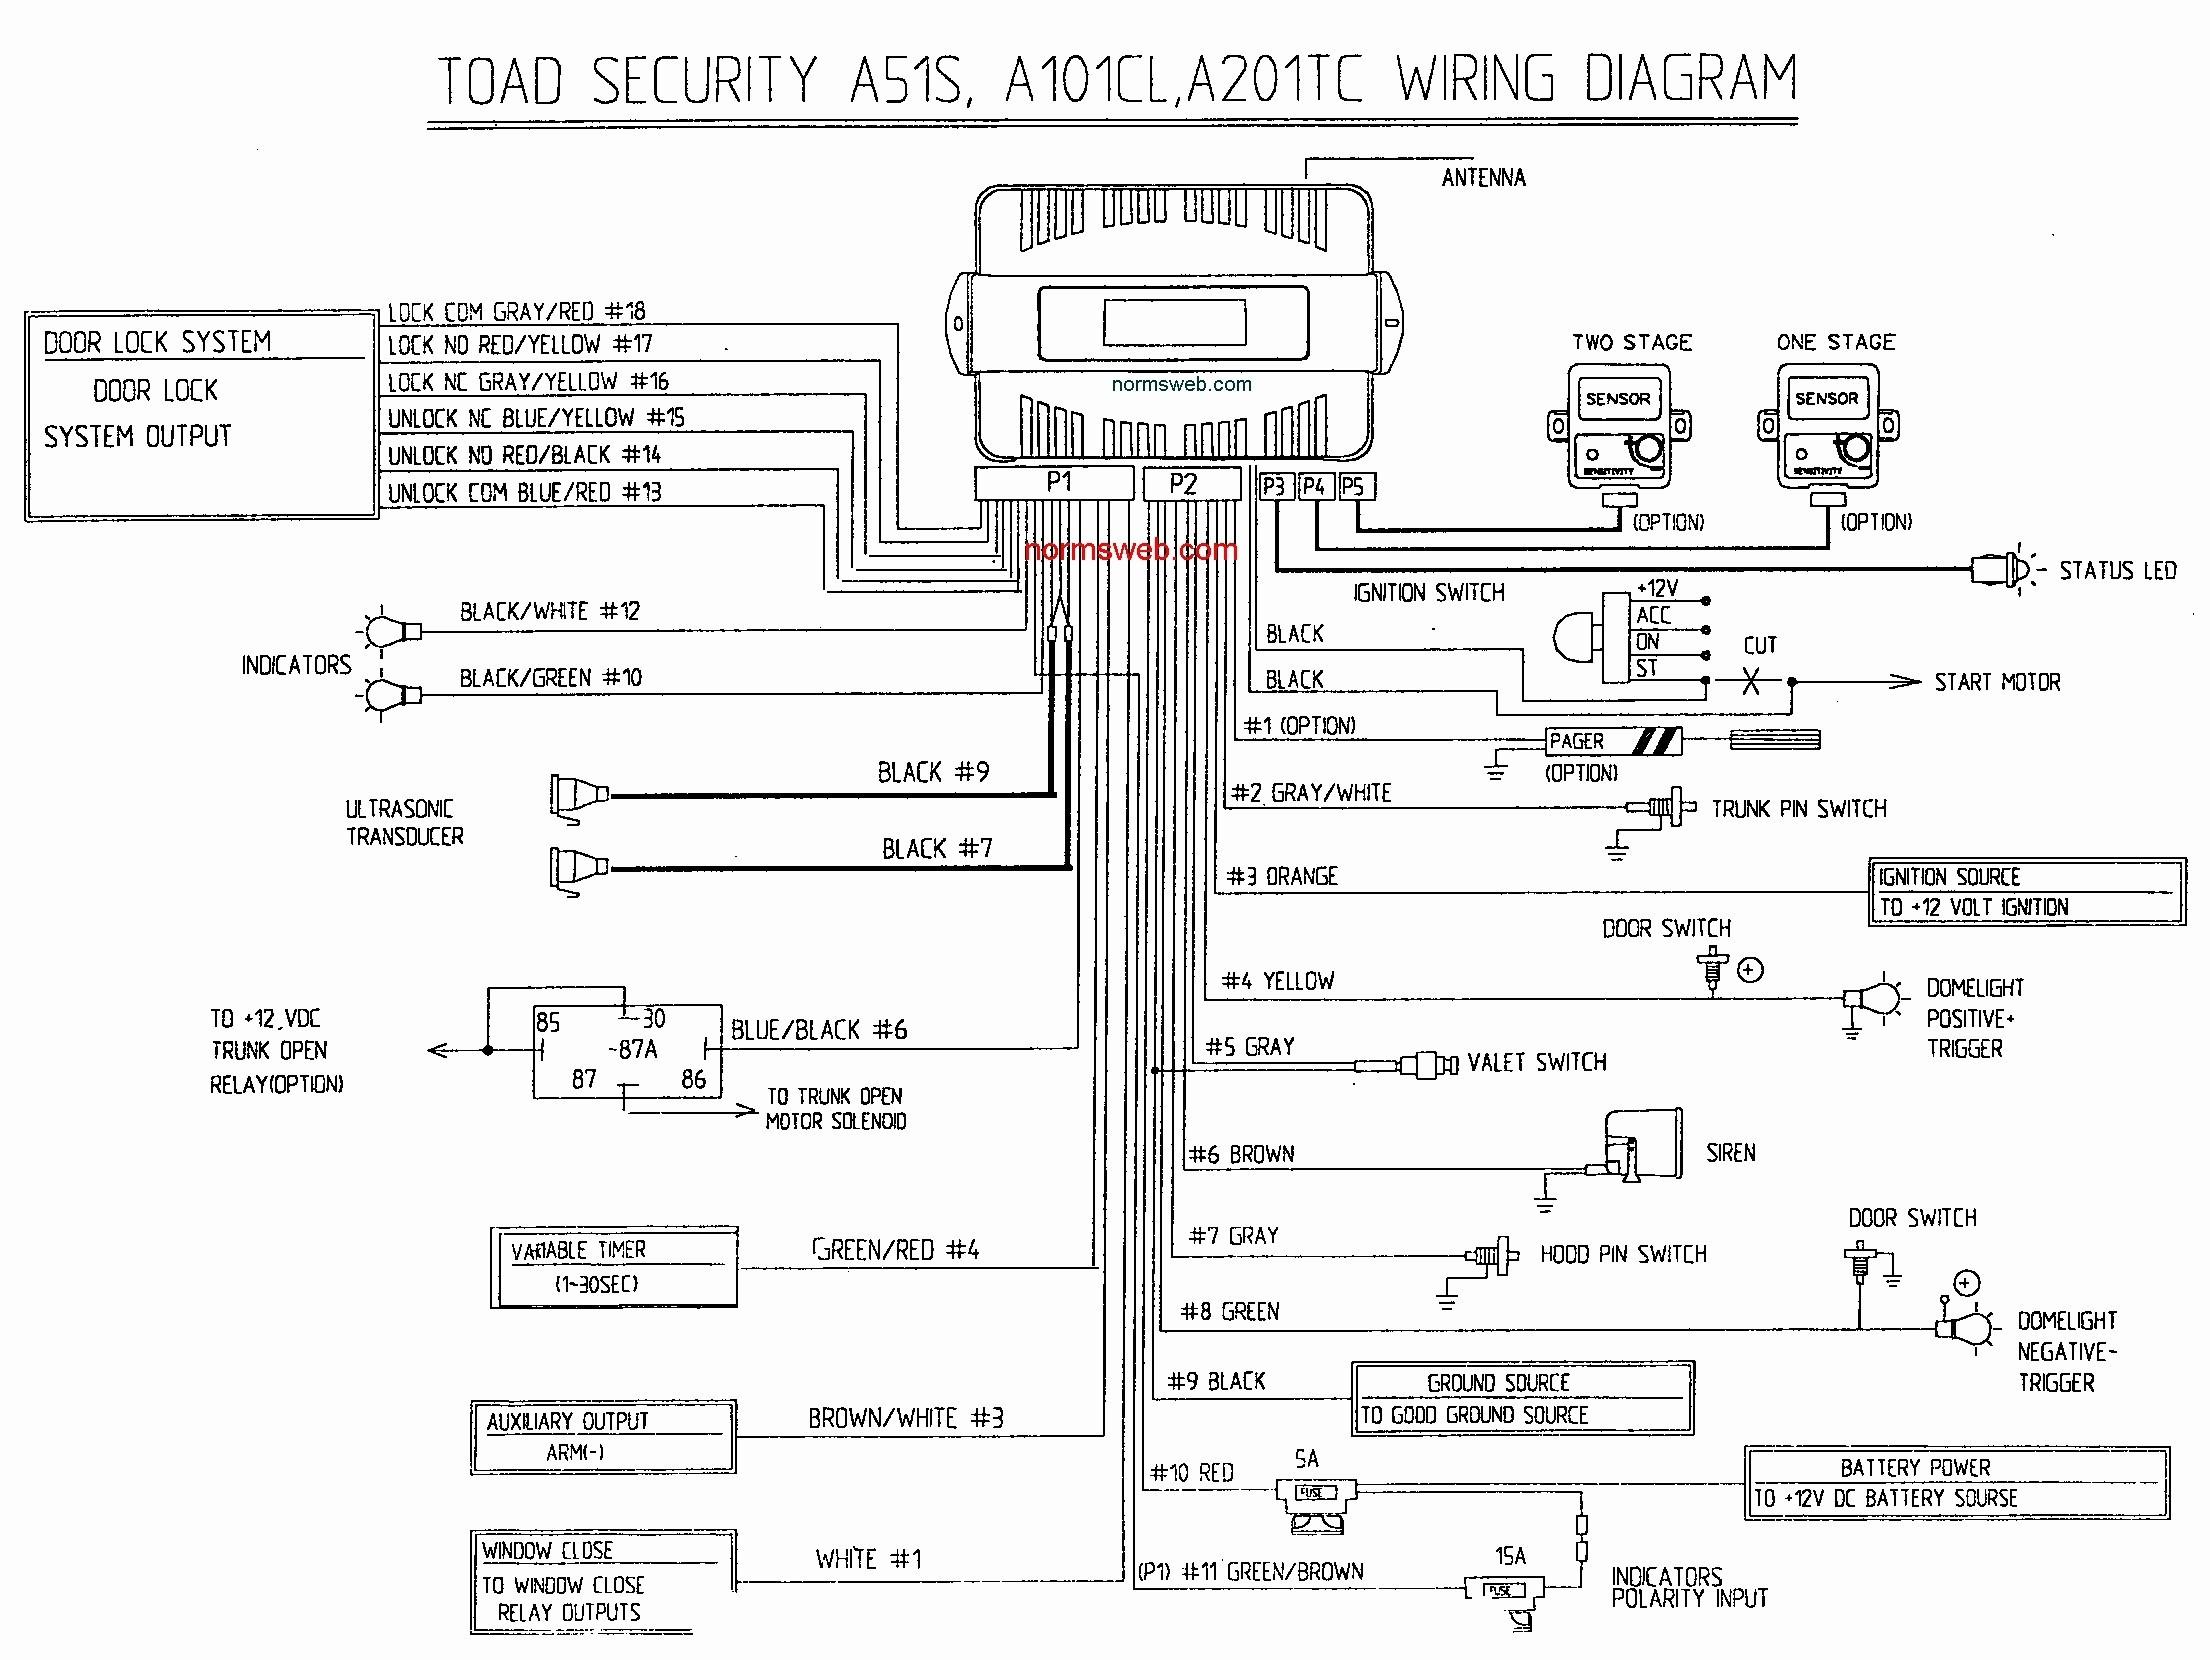 Steelmate Car Alarm Wiring Diagram Hornet Car Alarm Wiring Diagram Of Steelmate Car Alarm Wiring Diagram